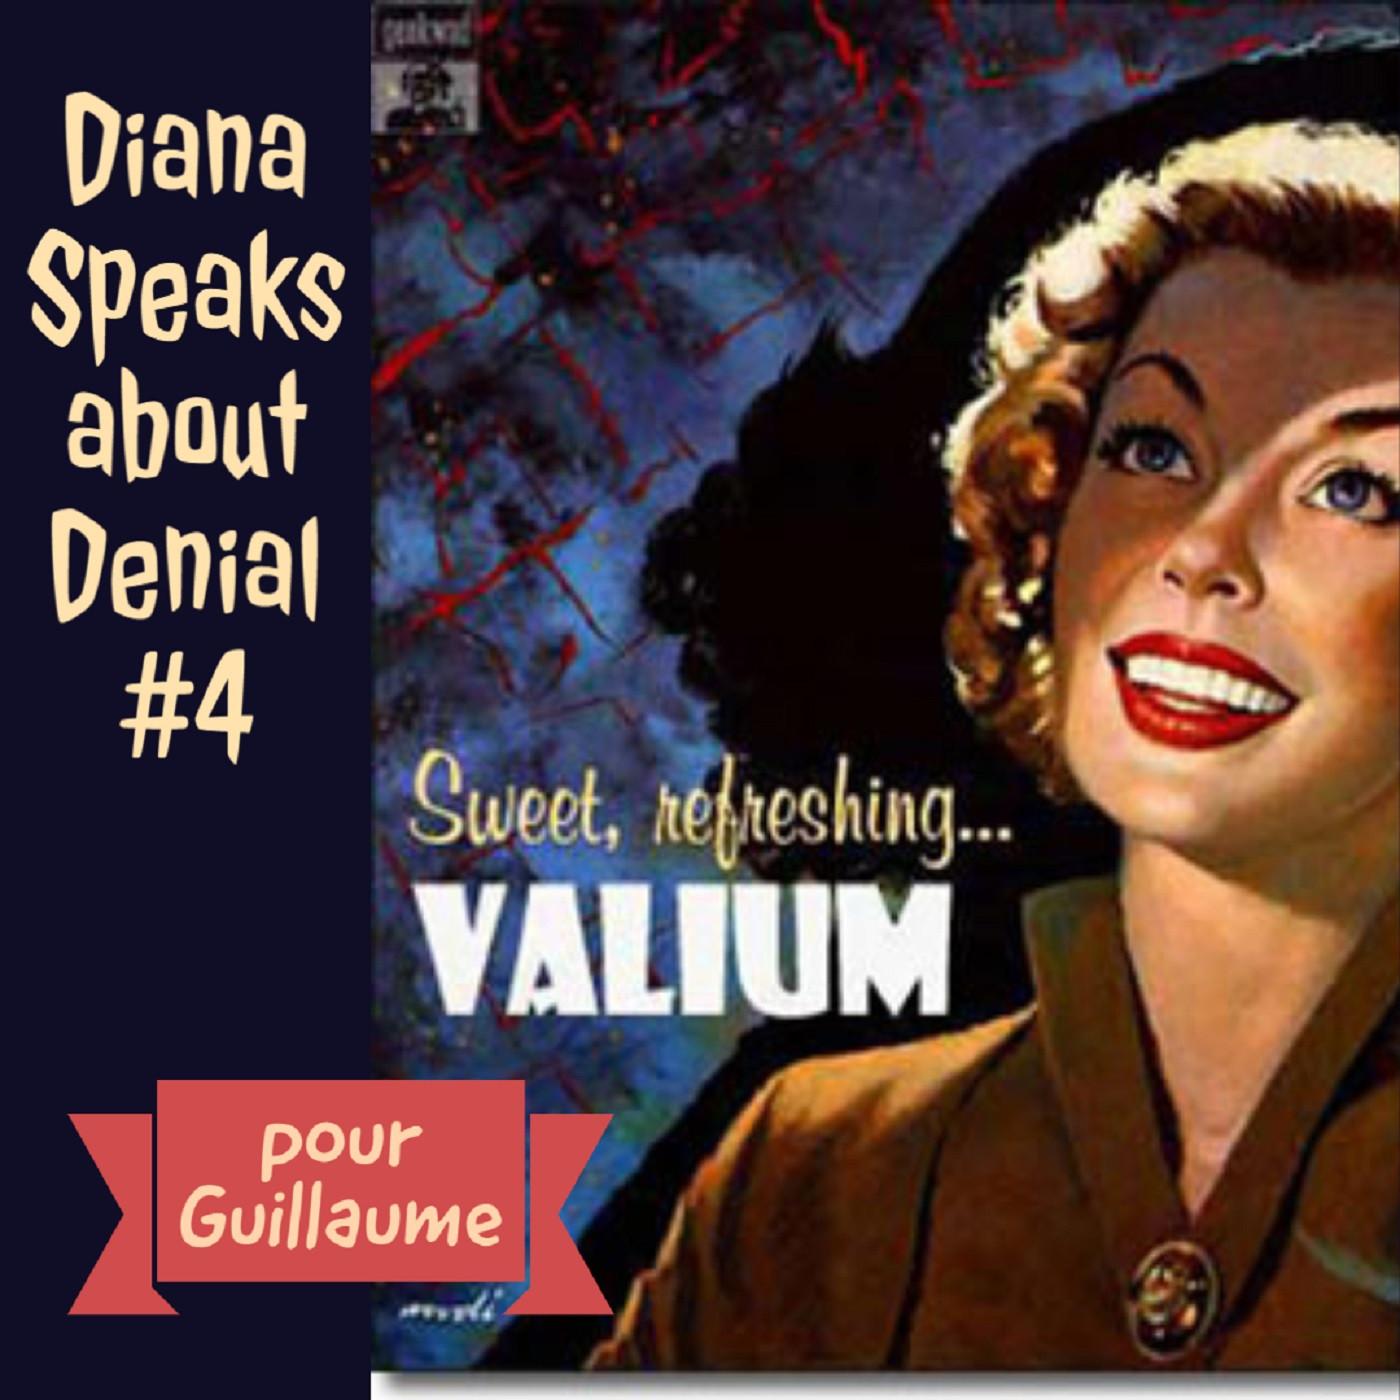 Diana Speaks about Denial.